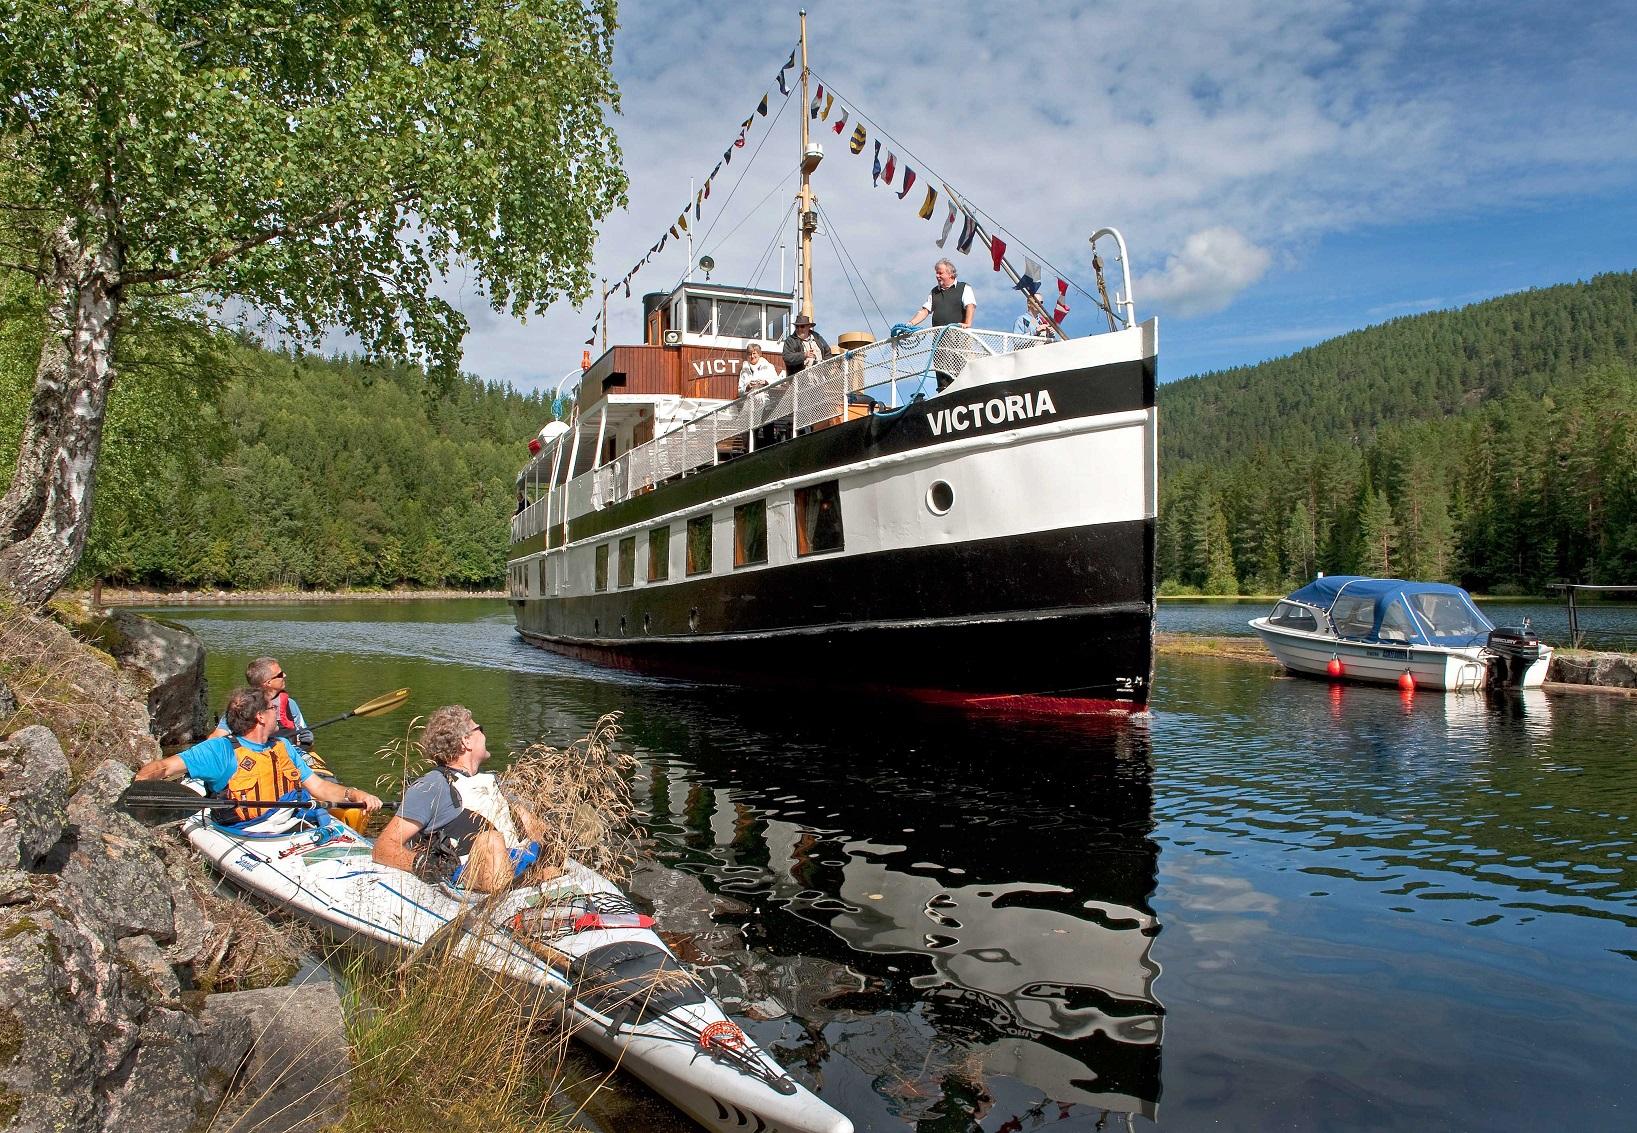 Båt i kanal i Telemarkl